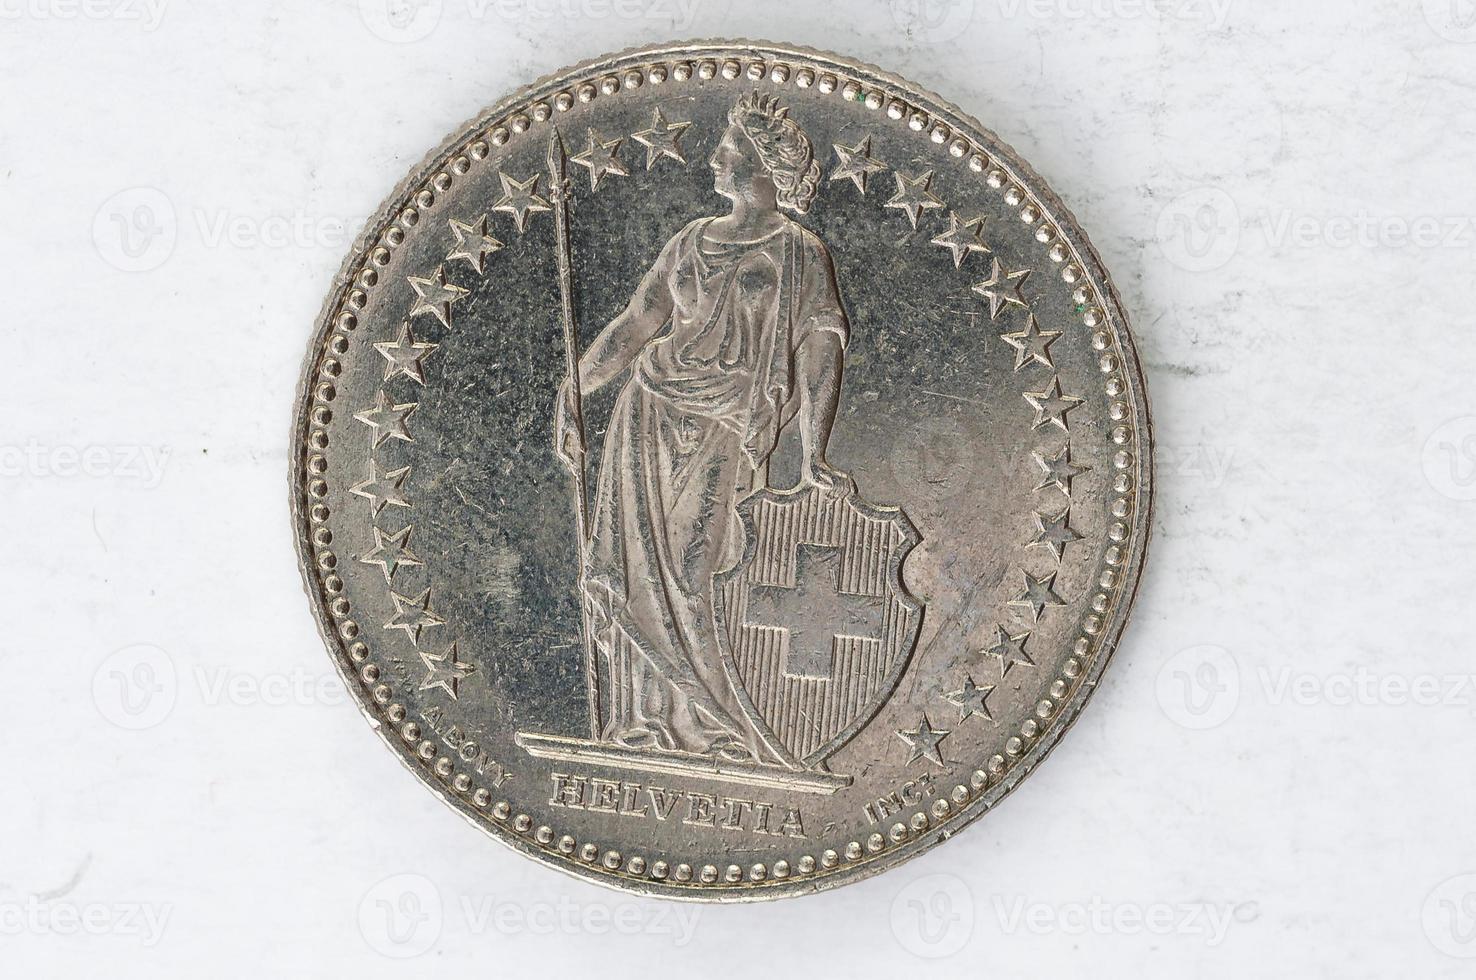 moneta svizzera due francobolli argento 2007 foto